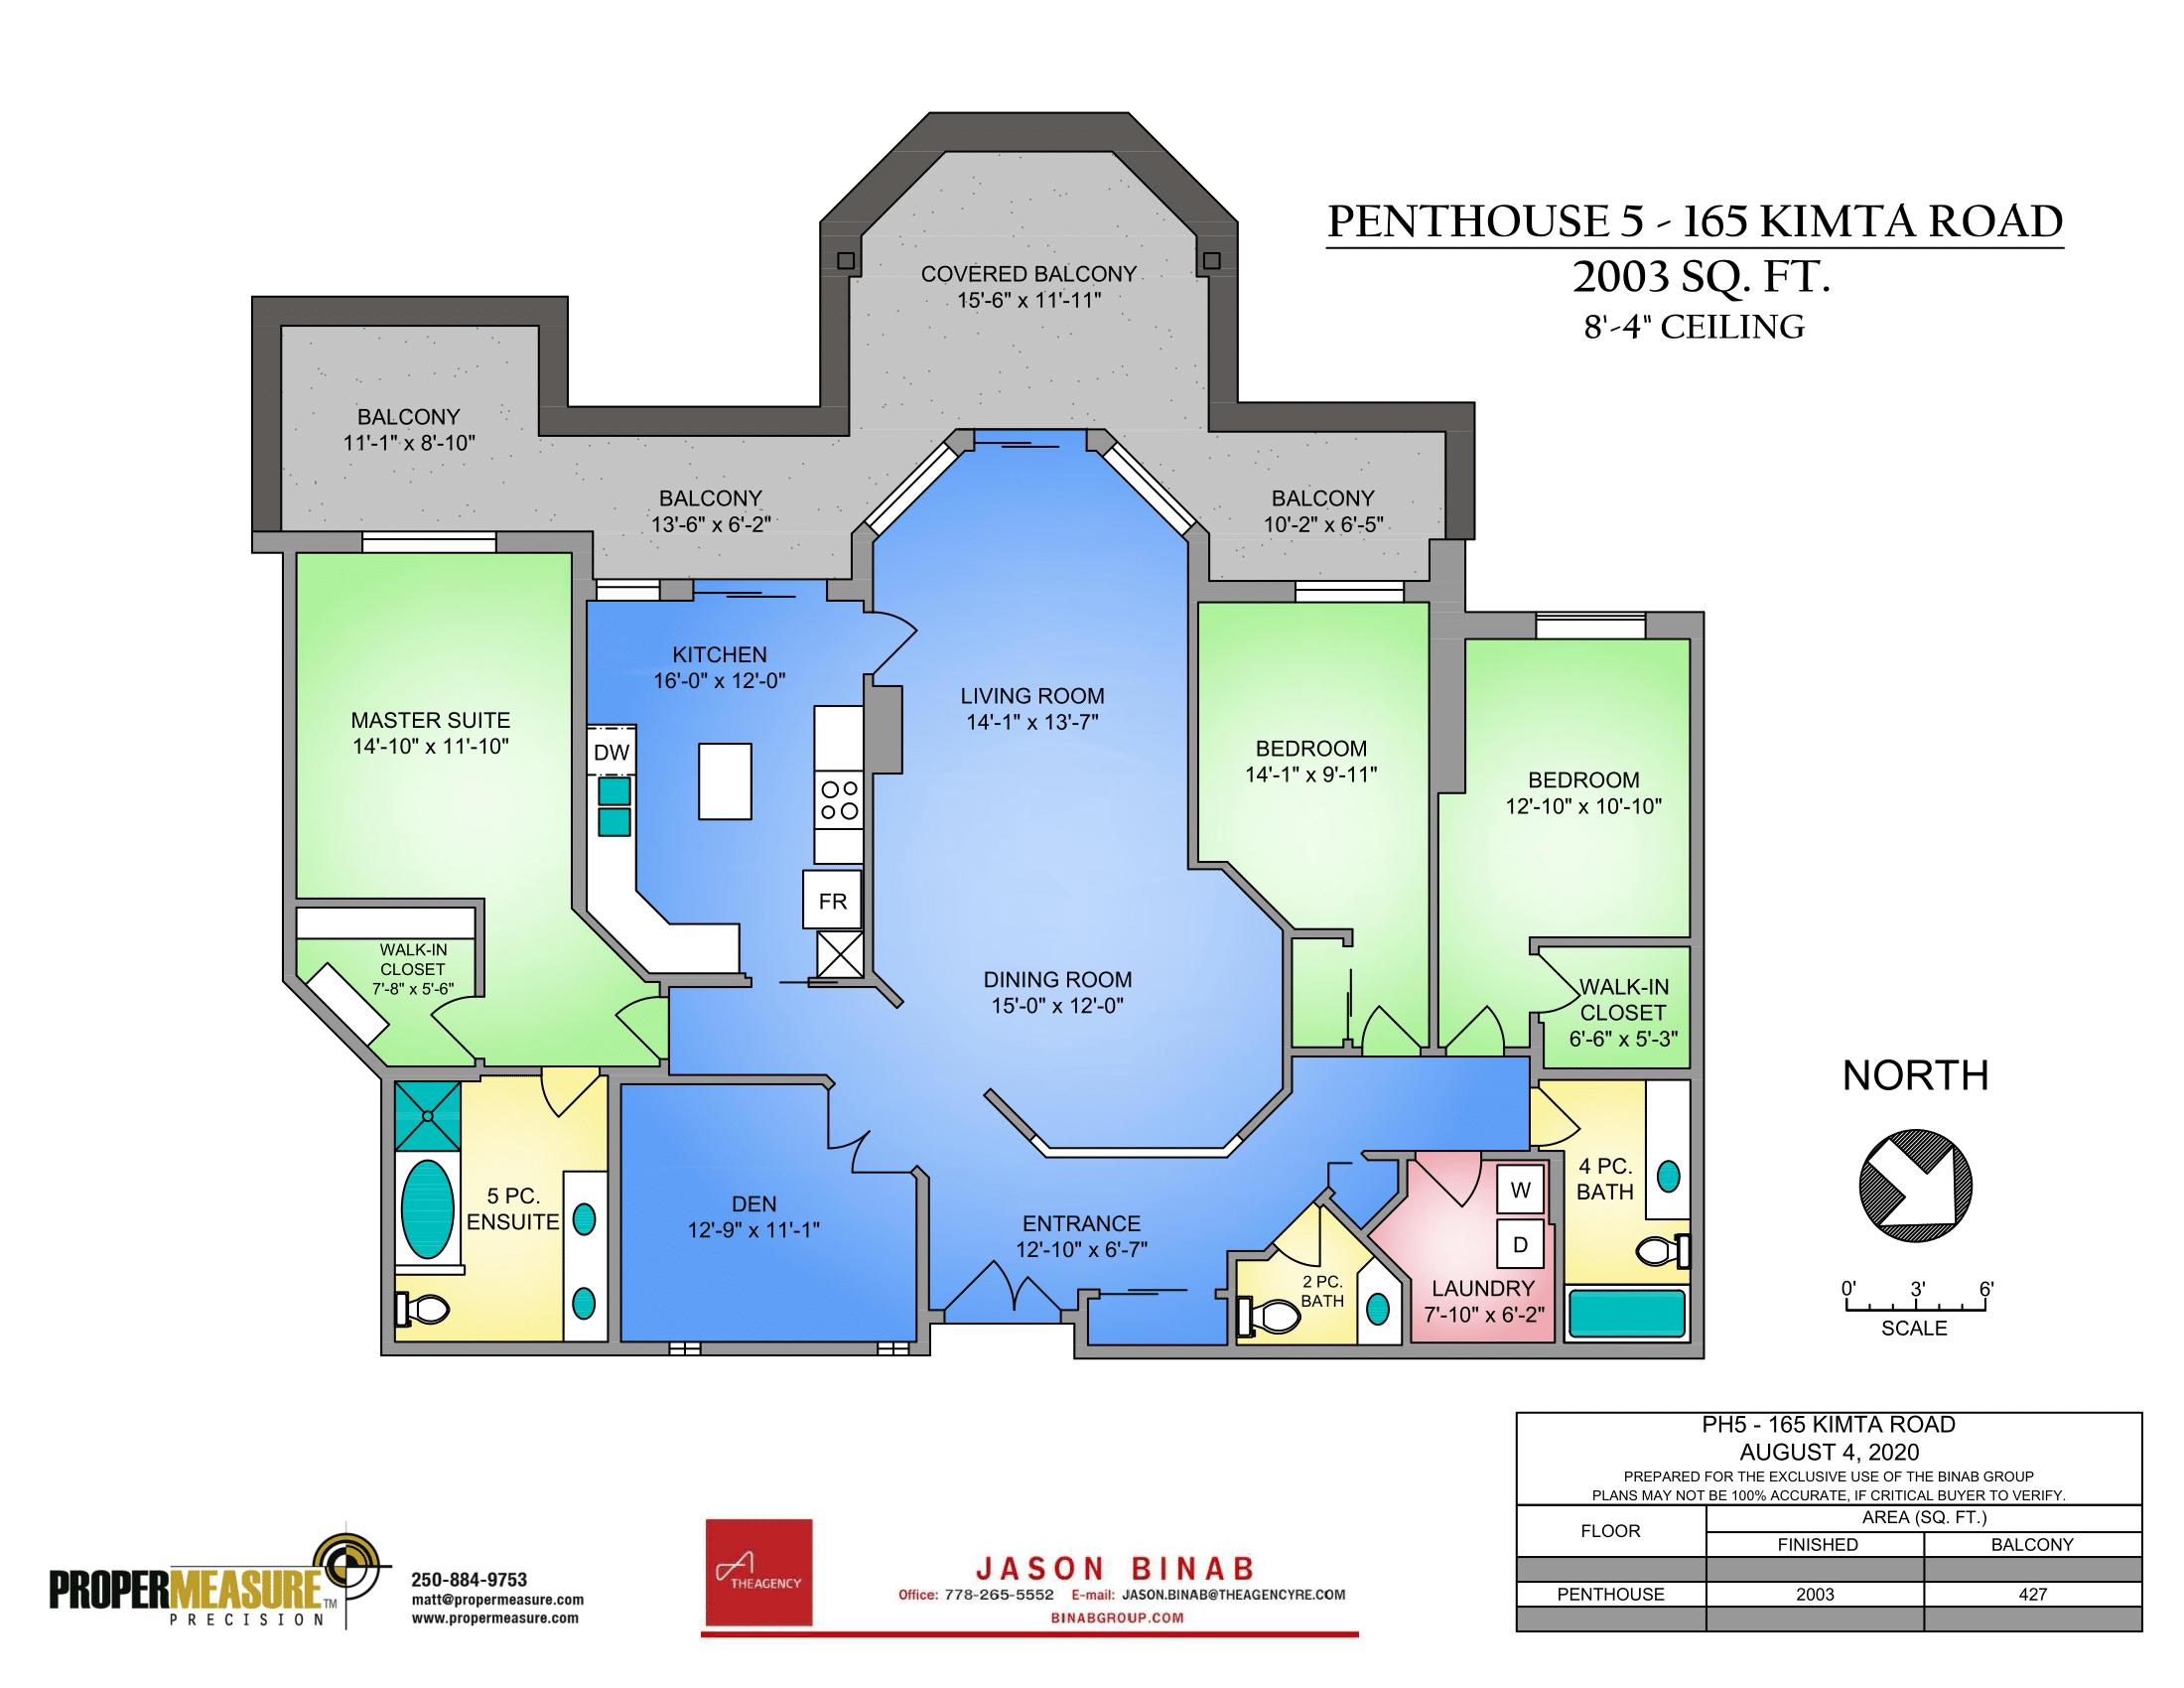 Penthouse condo floor plans Victoria